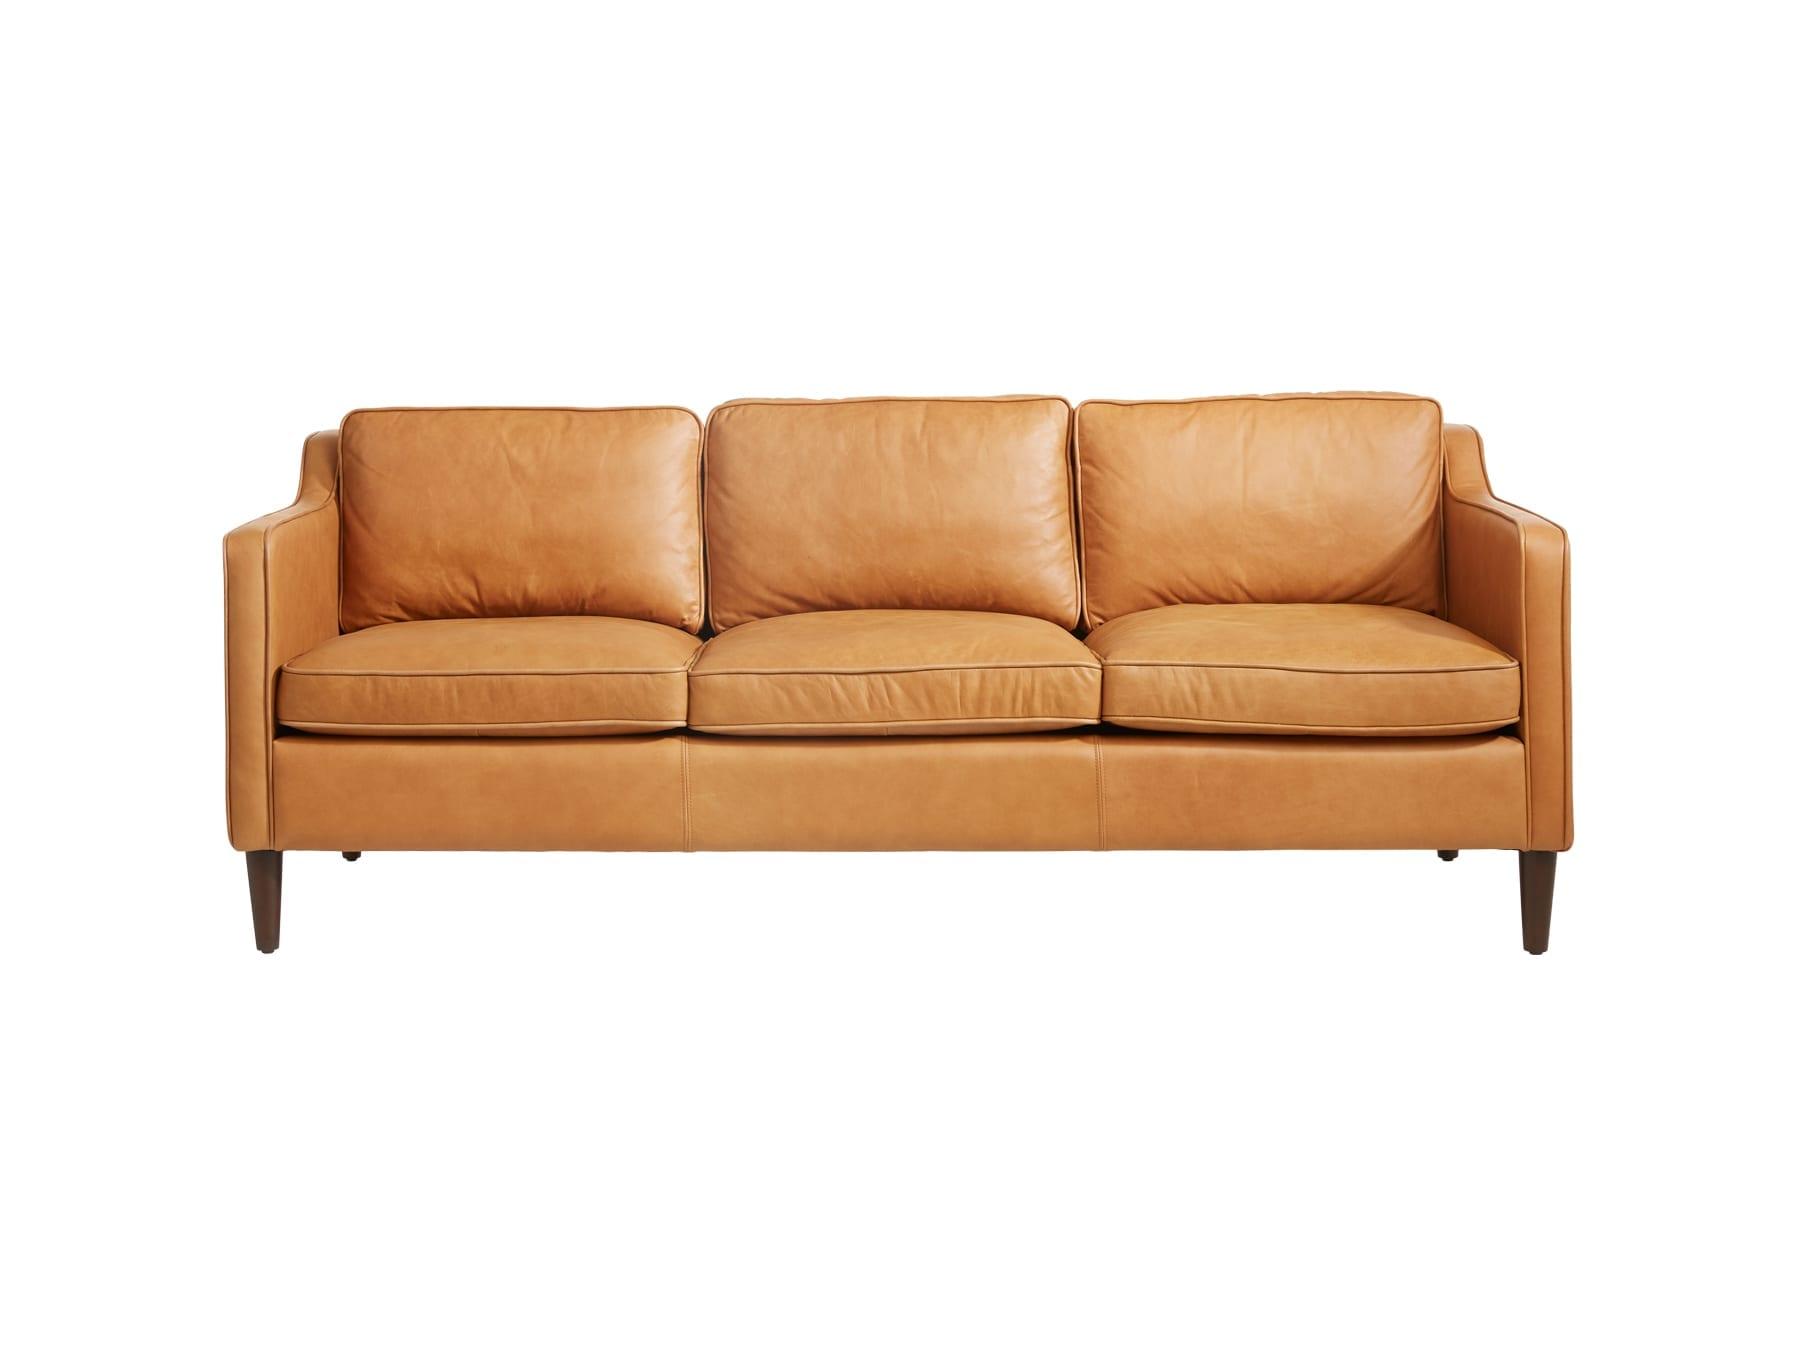 Carezza Stirling Sofa